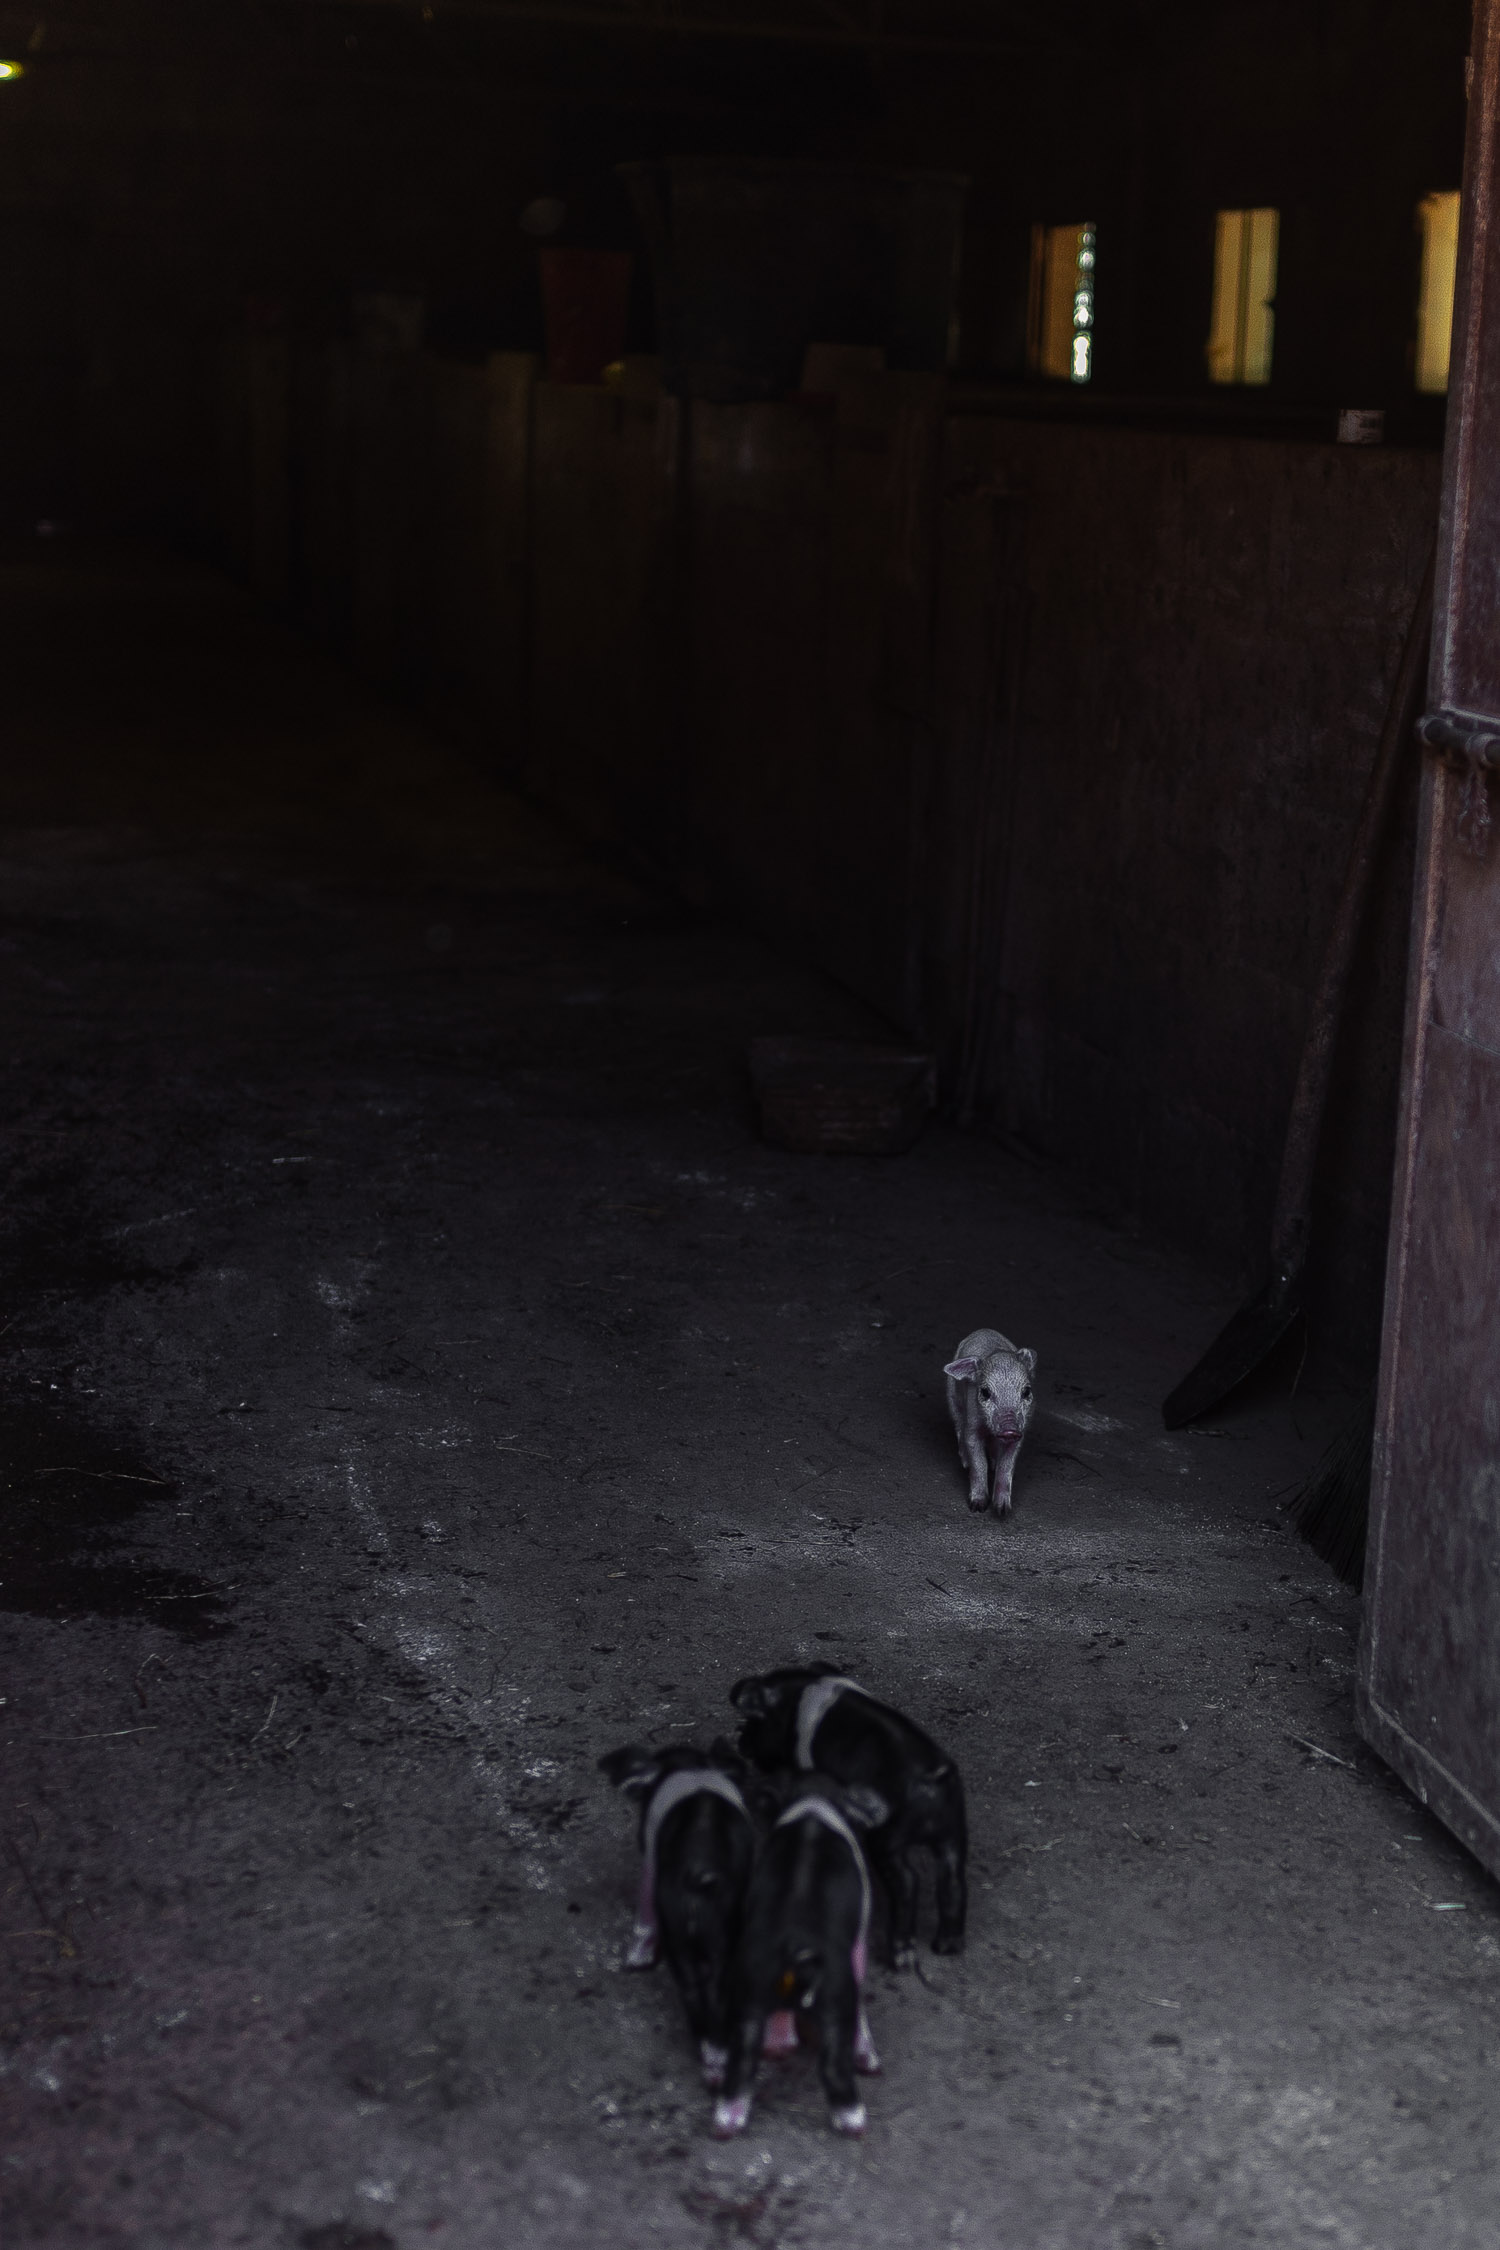 Tuscany-baby-pigs-4569.jpg